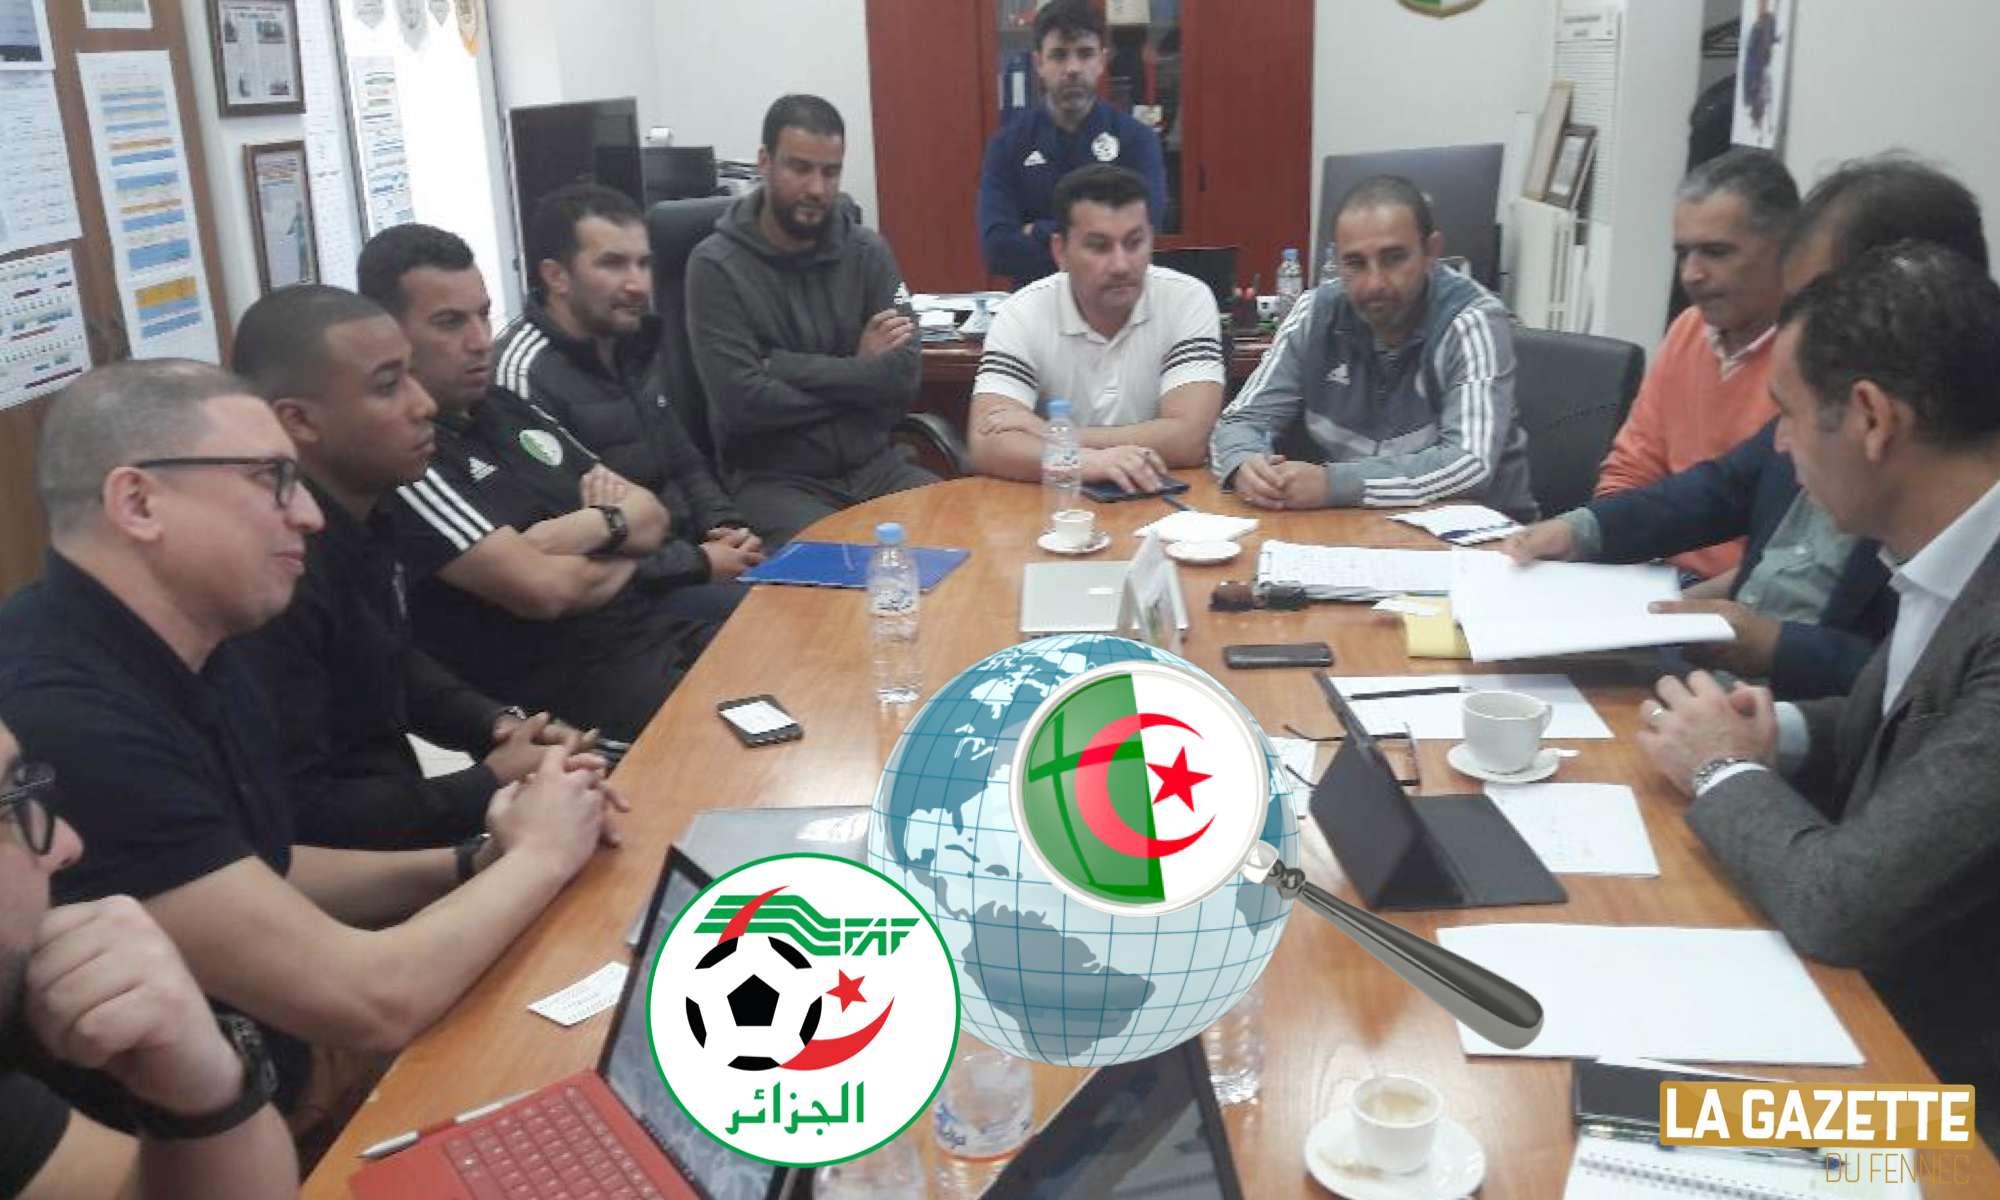 task force dtn detection jeunes brahimi lyes karim idir kada hounet foued